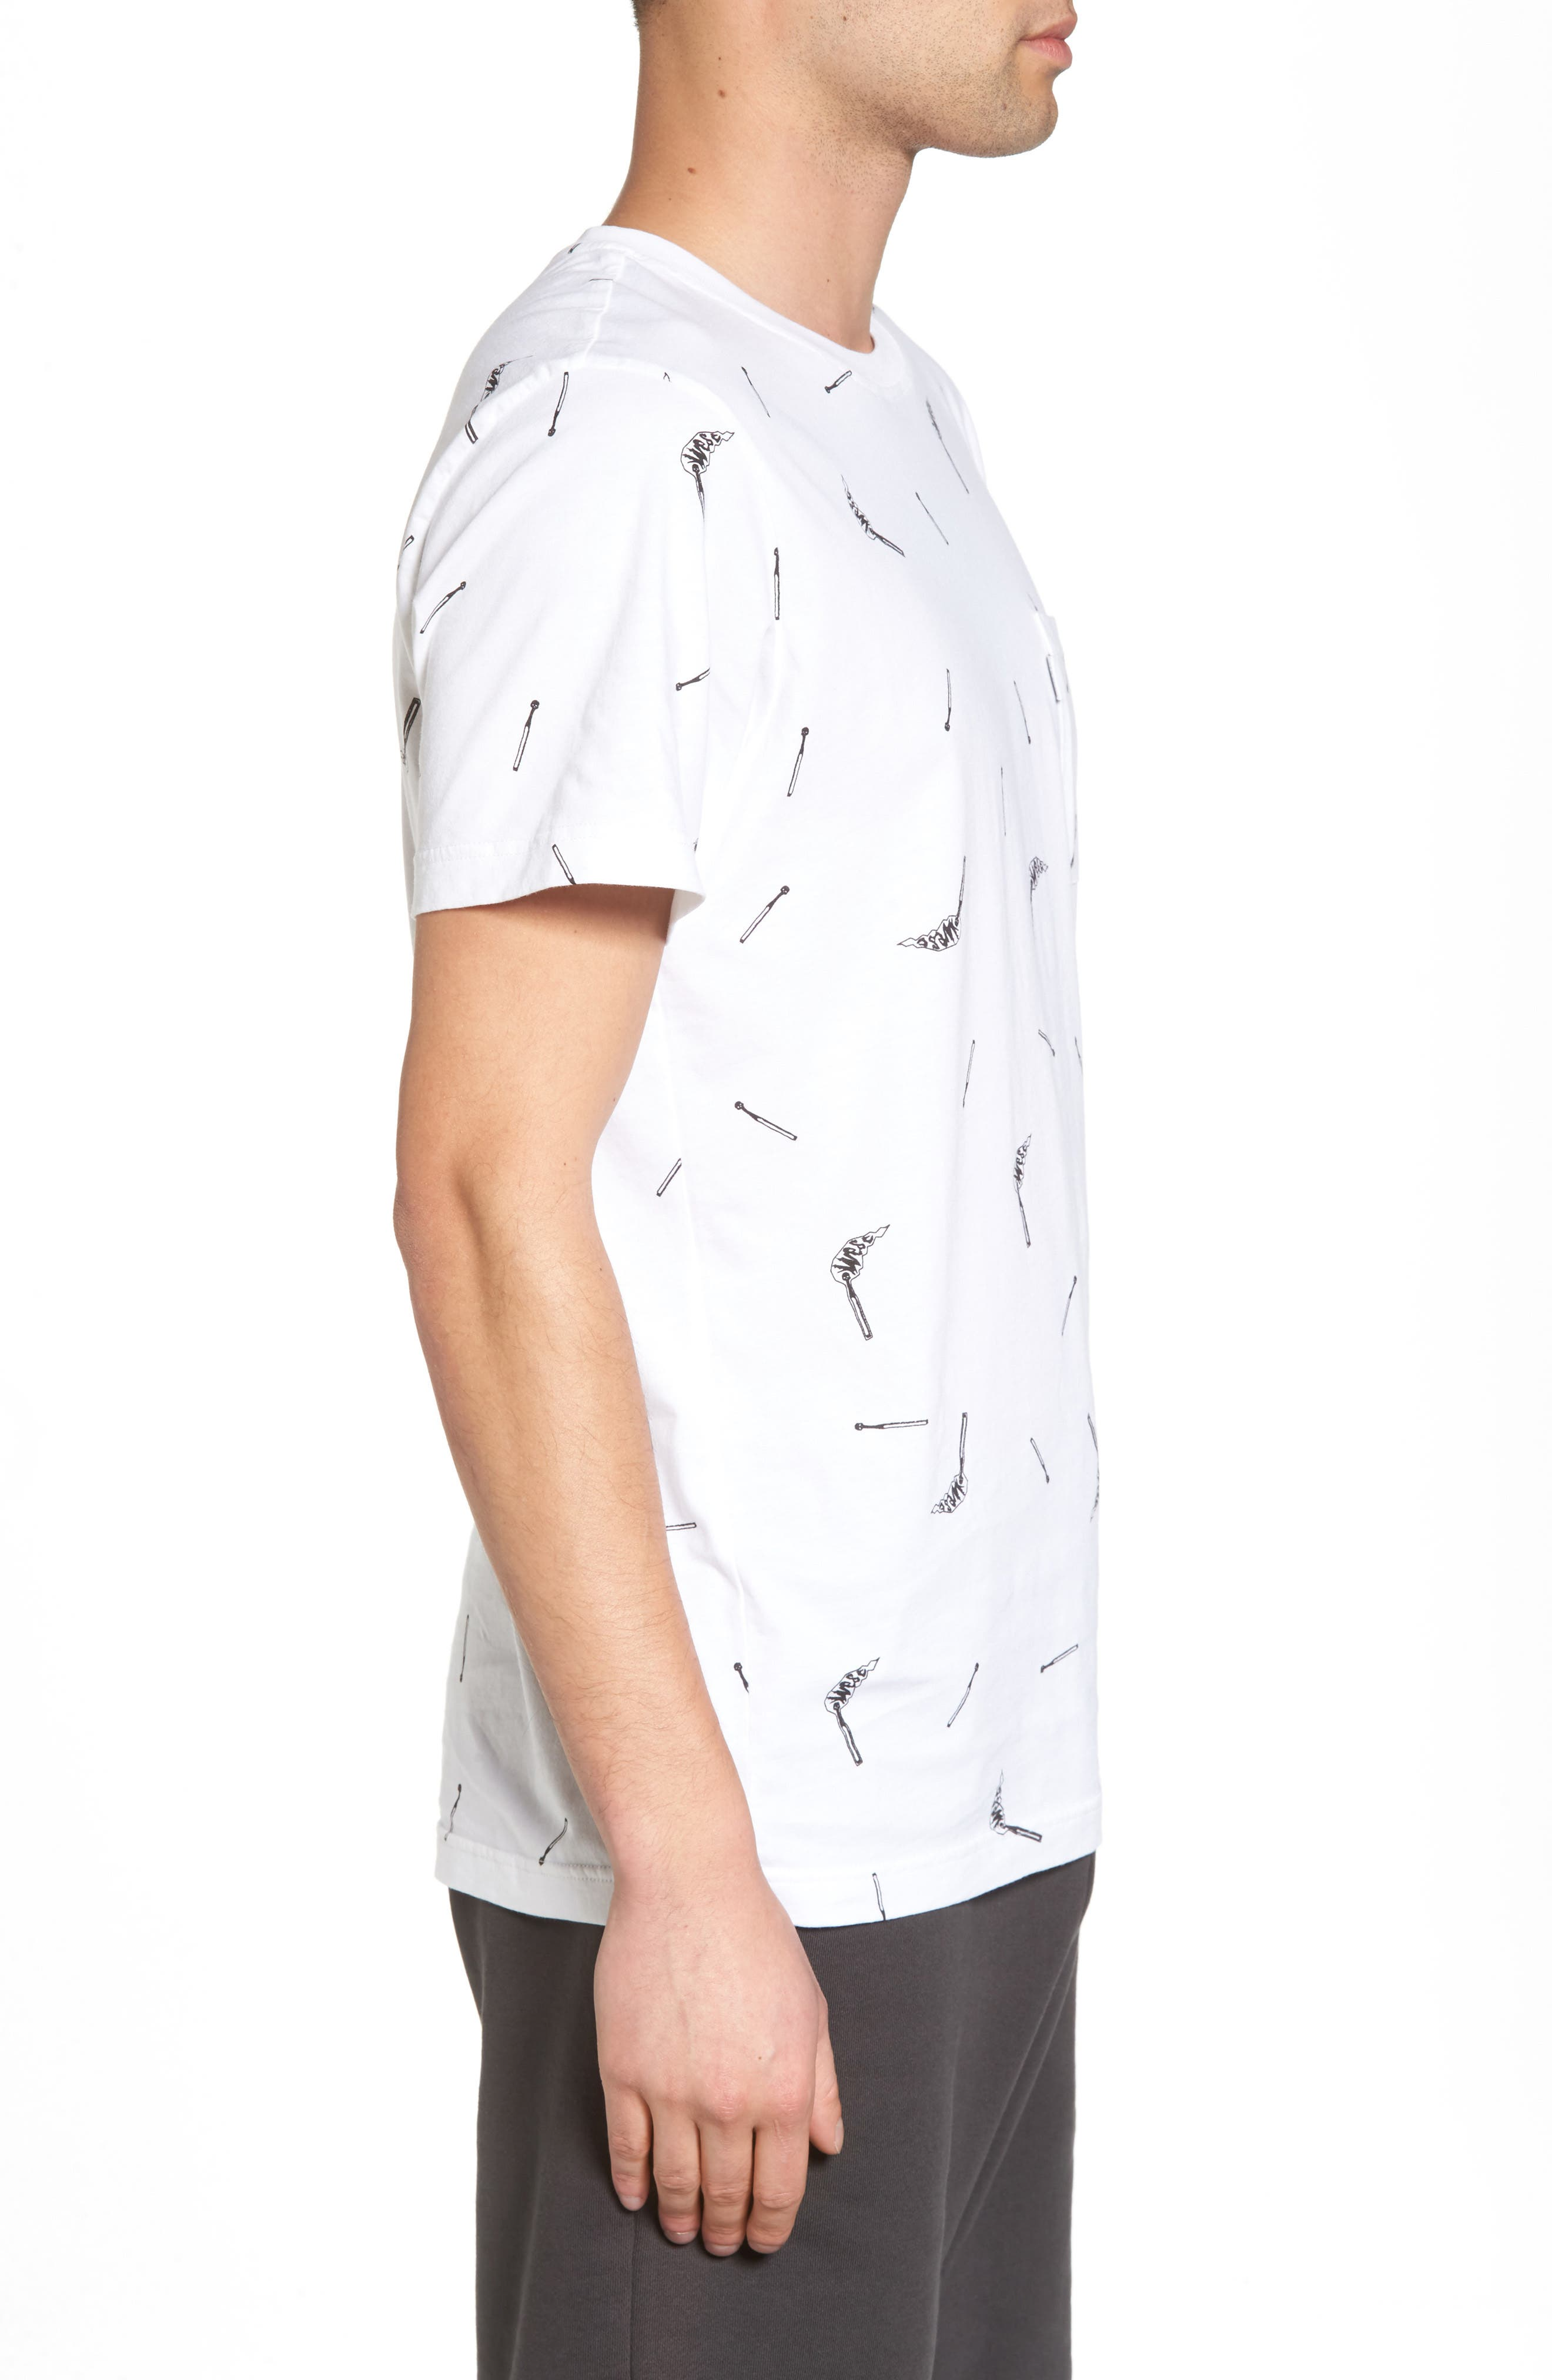 Maxwell Matchsticks T-Shirt,                             Alternate thumbnail 3, color,                             White